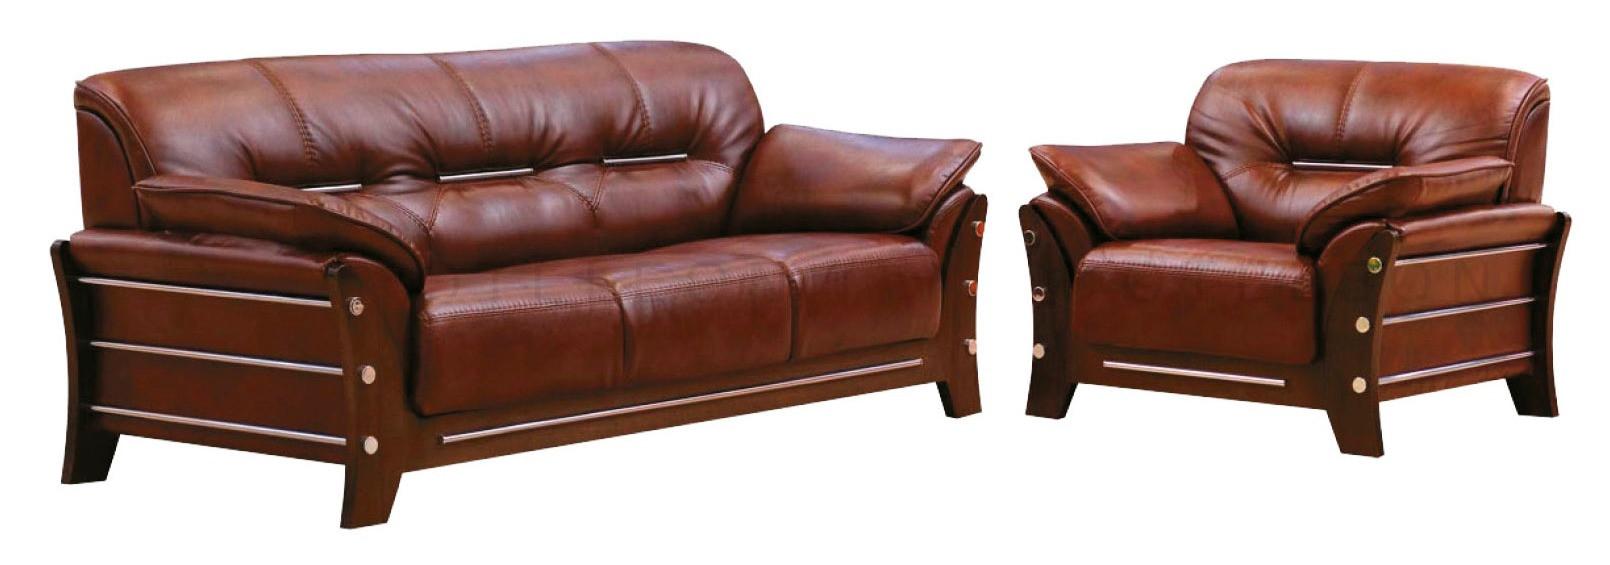 ЧЕСТЕР набор мягкой мебели